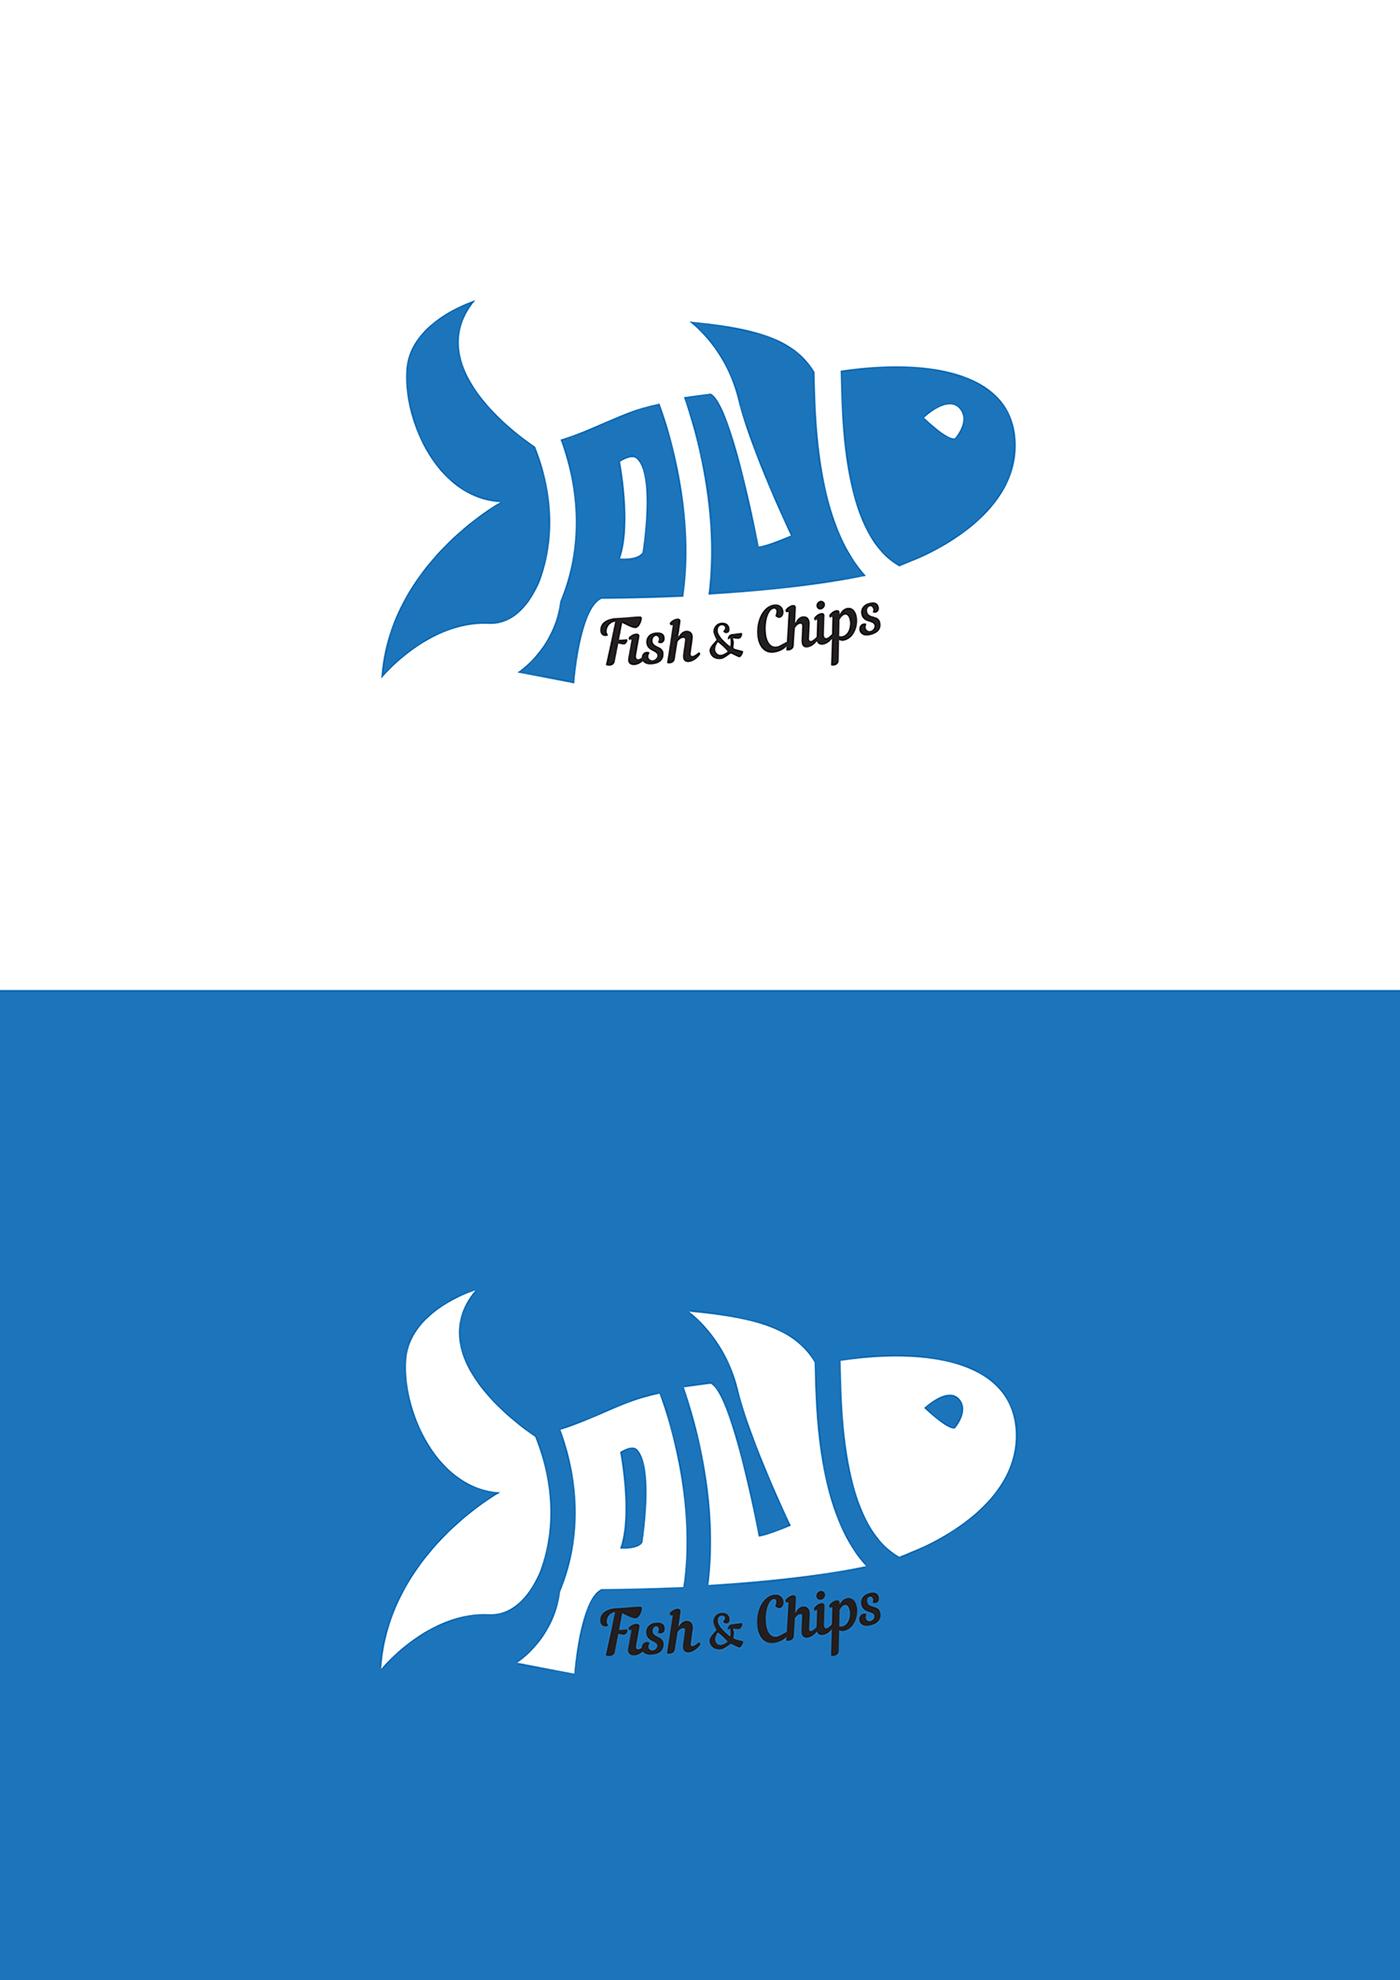 fish & chip fish shop fish logo food logo takeaway logo fish shop identity